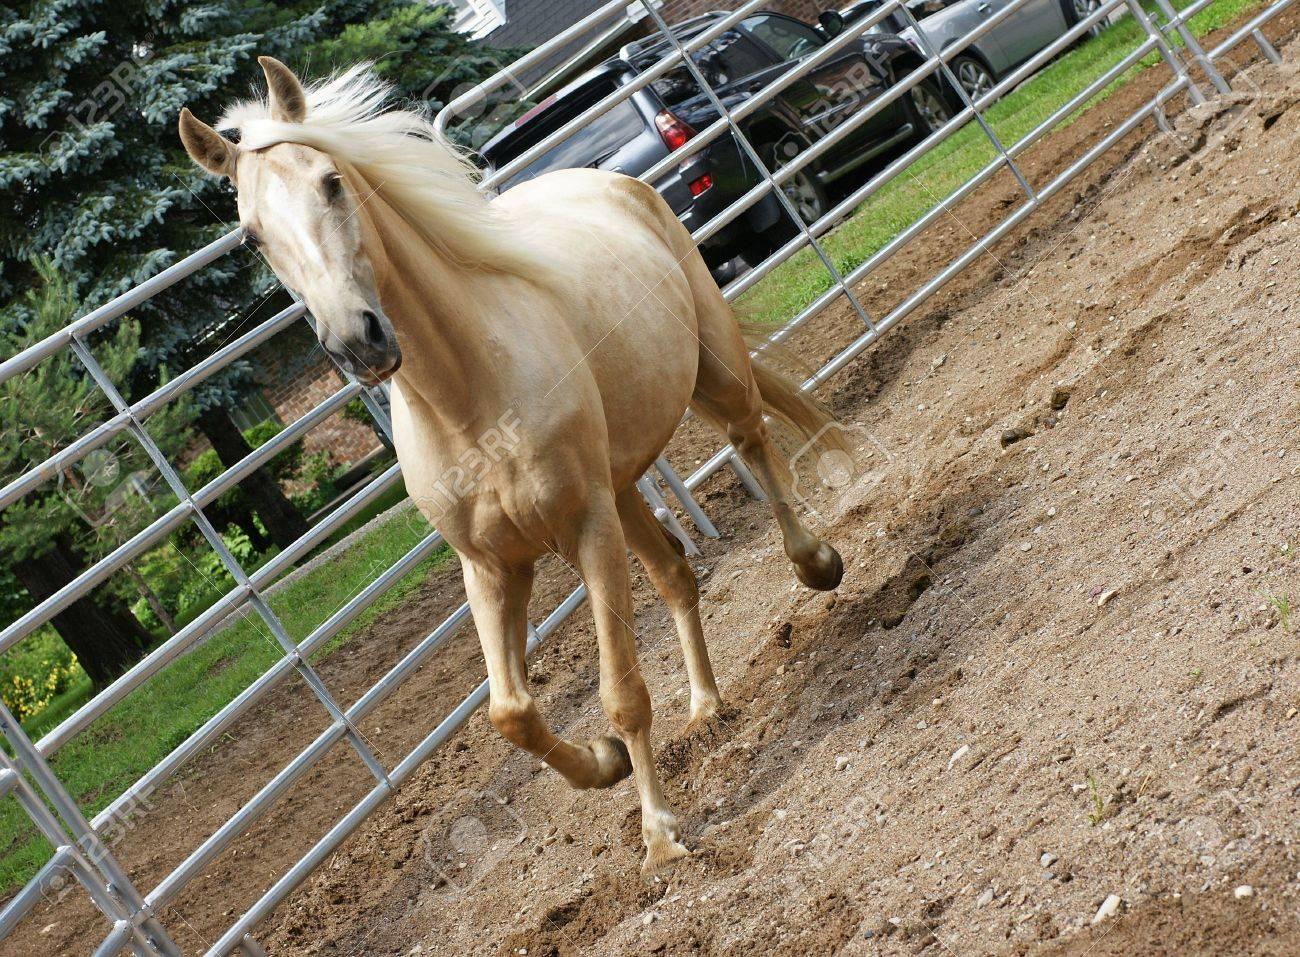 Palomino Kentucky Mountain Horse in the Ring - 5473034